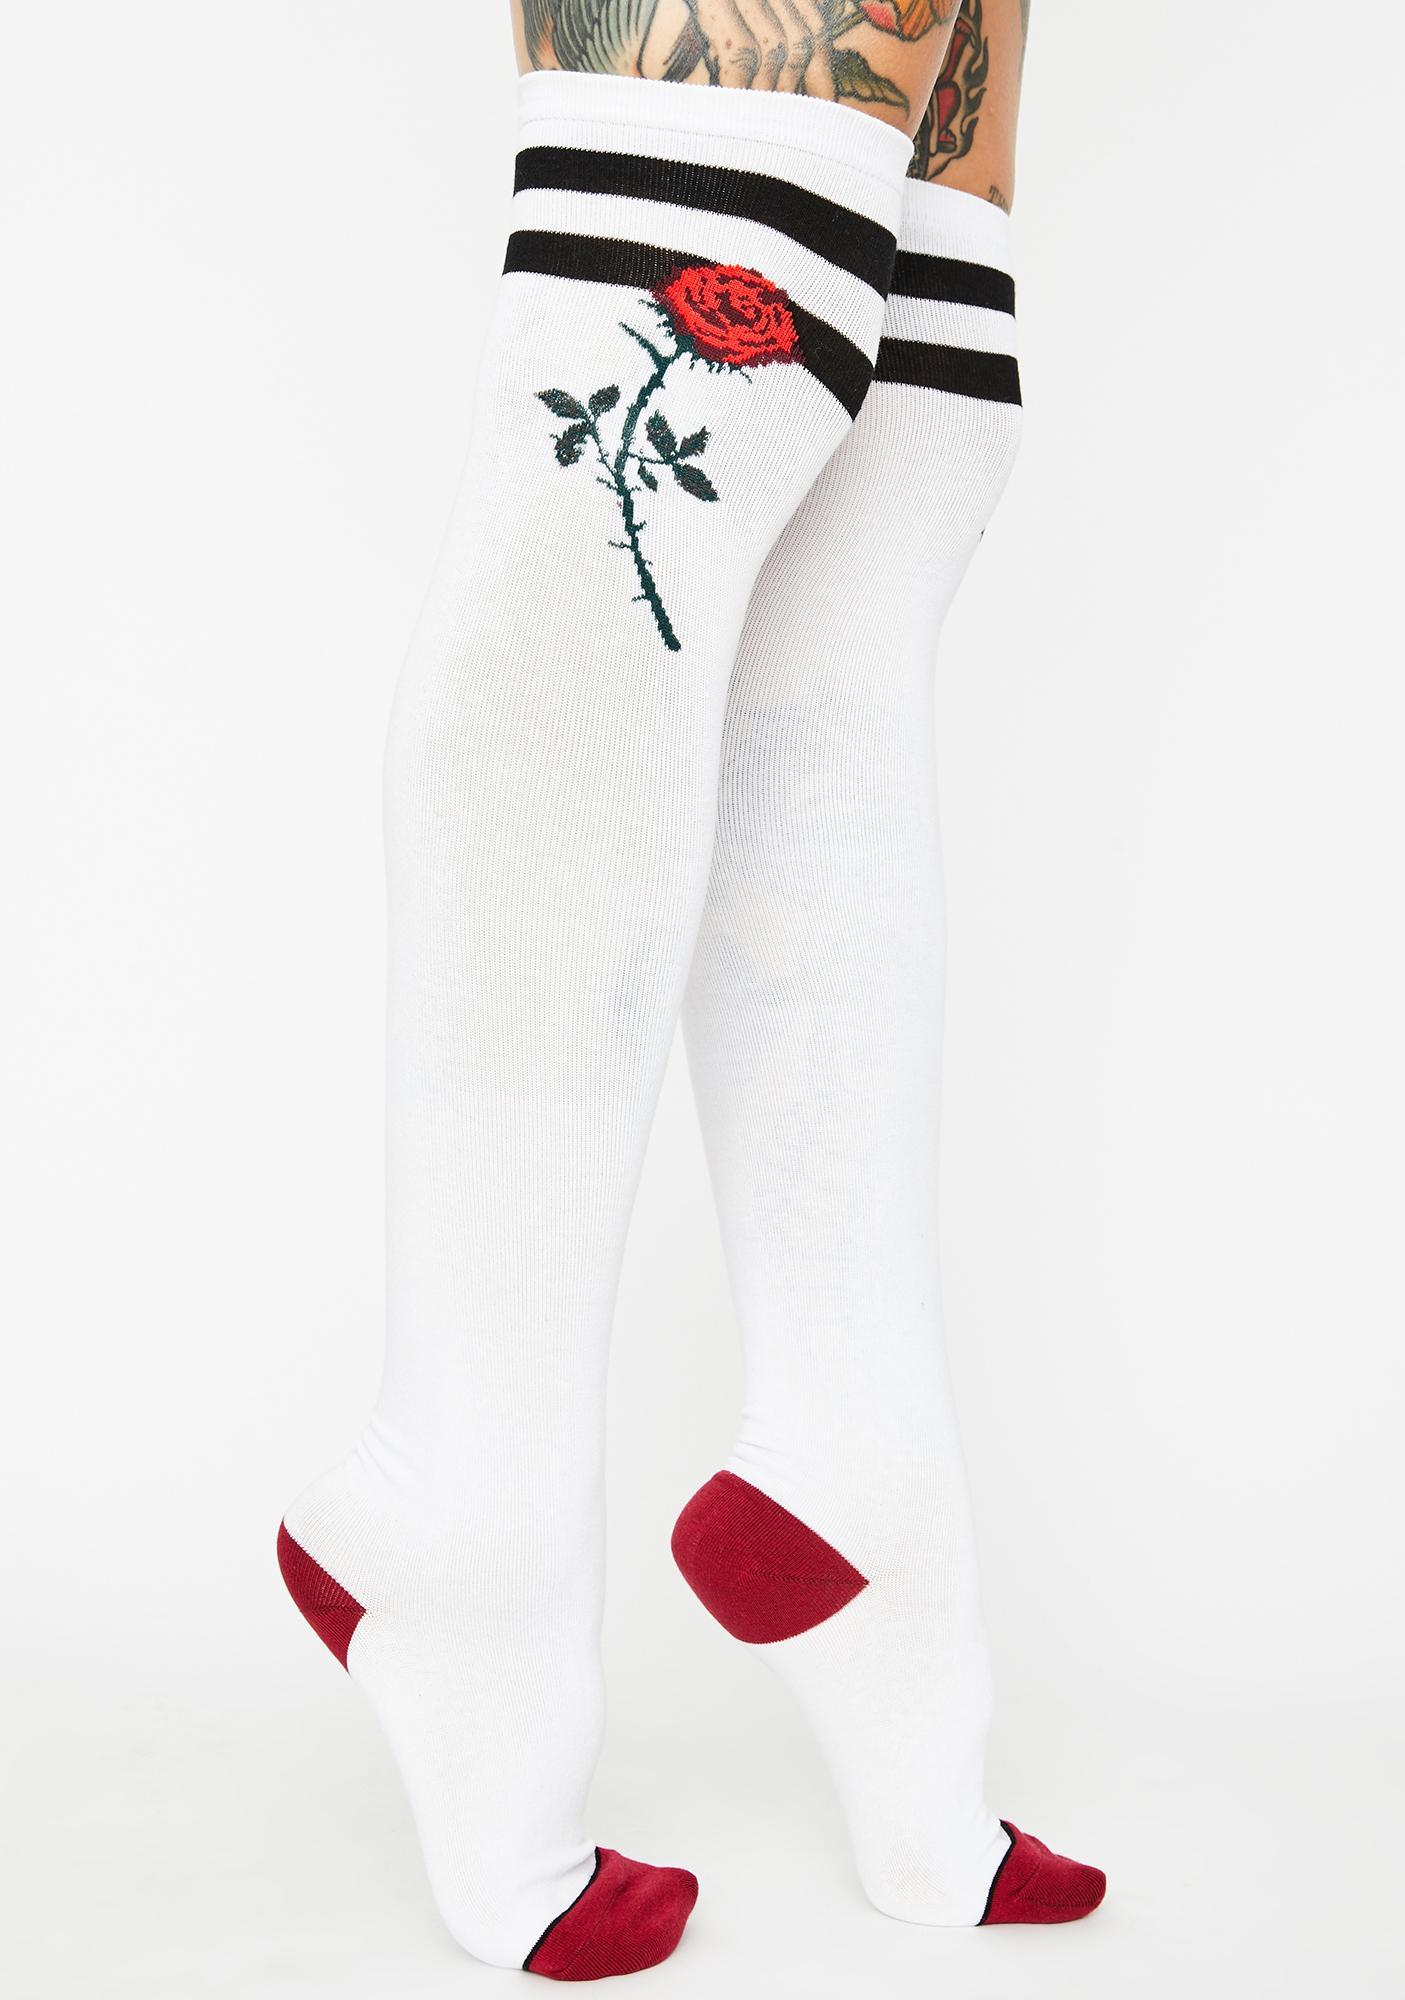 Forbidden Rose Thigh High Socks